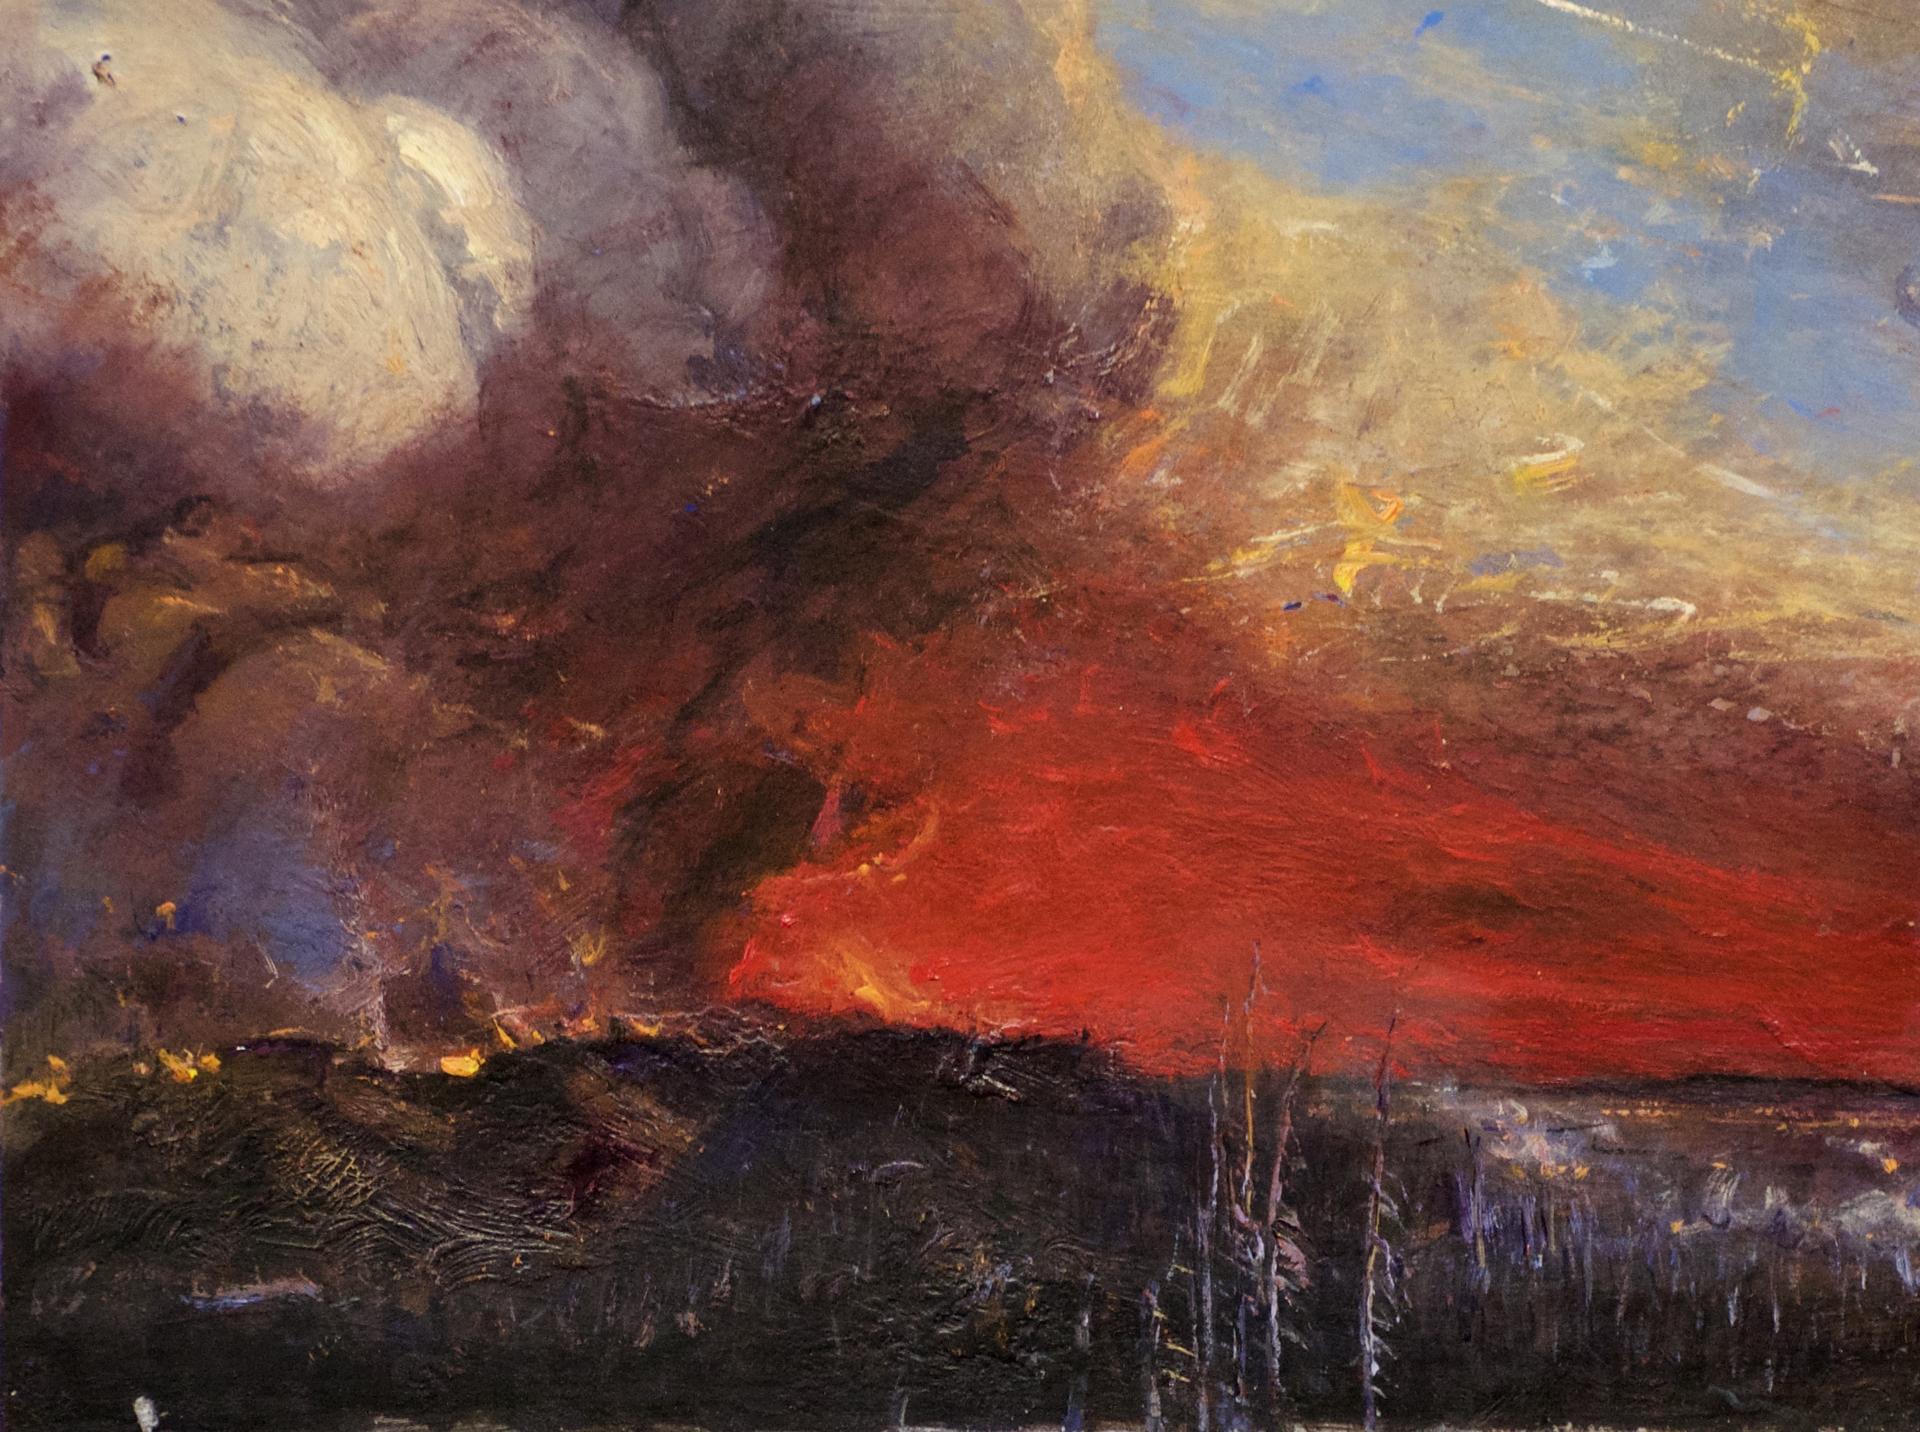 Fire Cloud by Gordon Brown